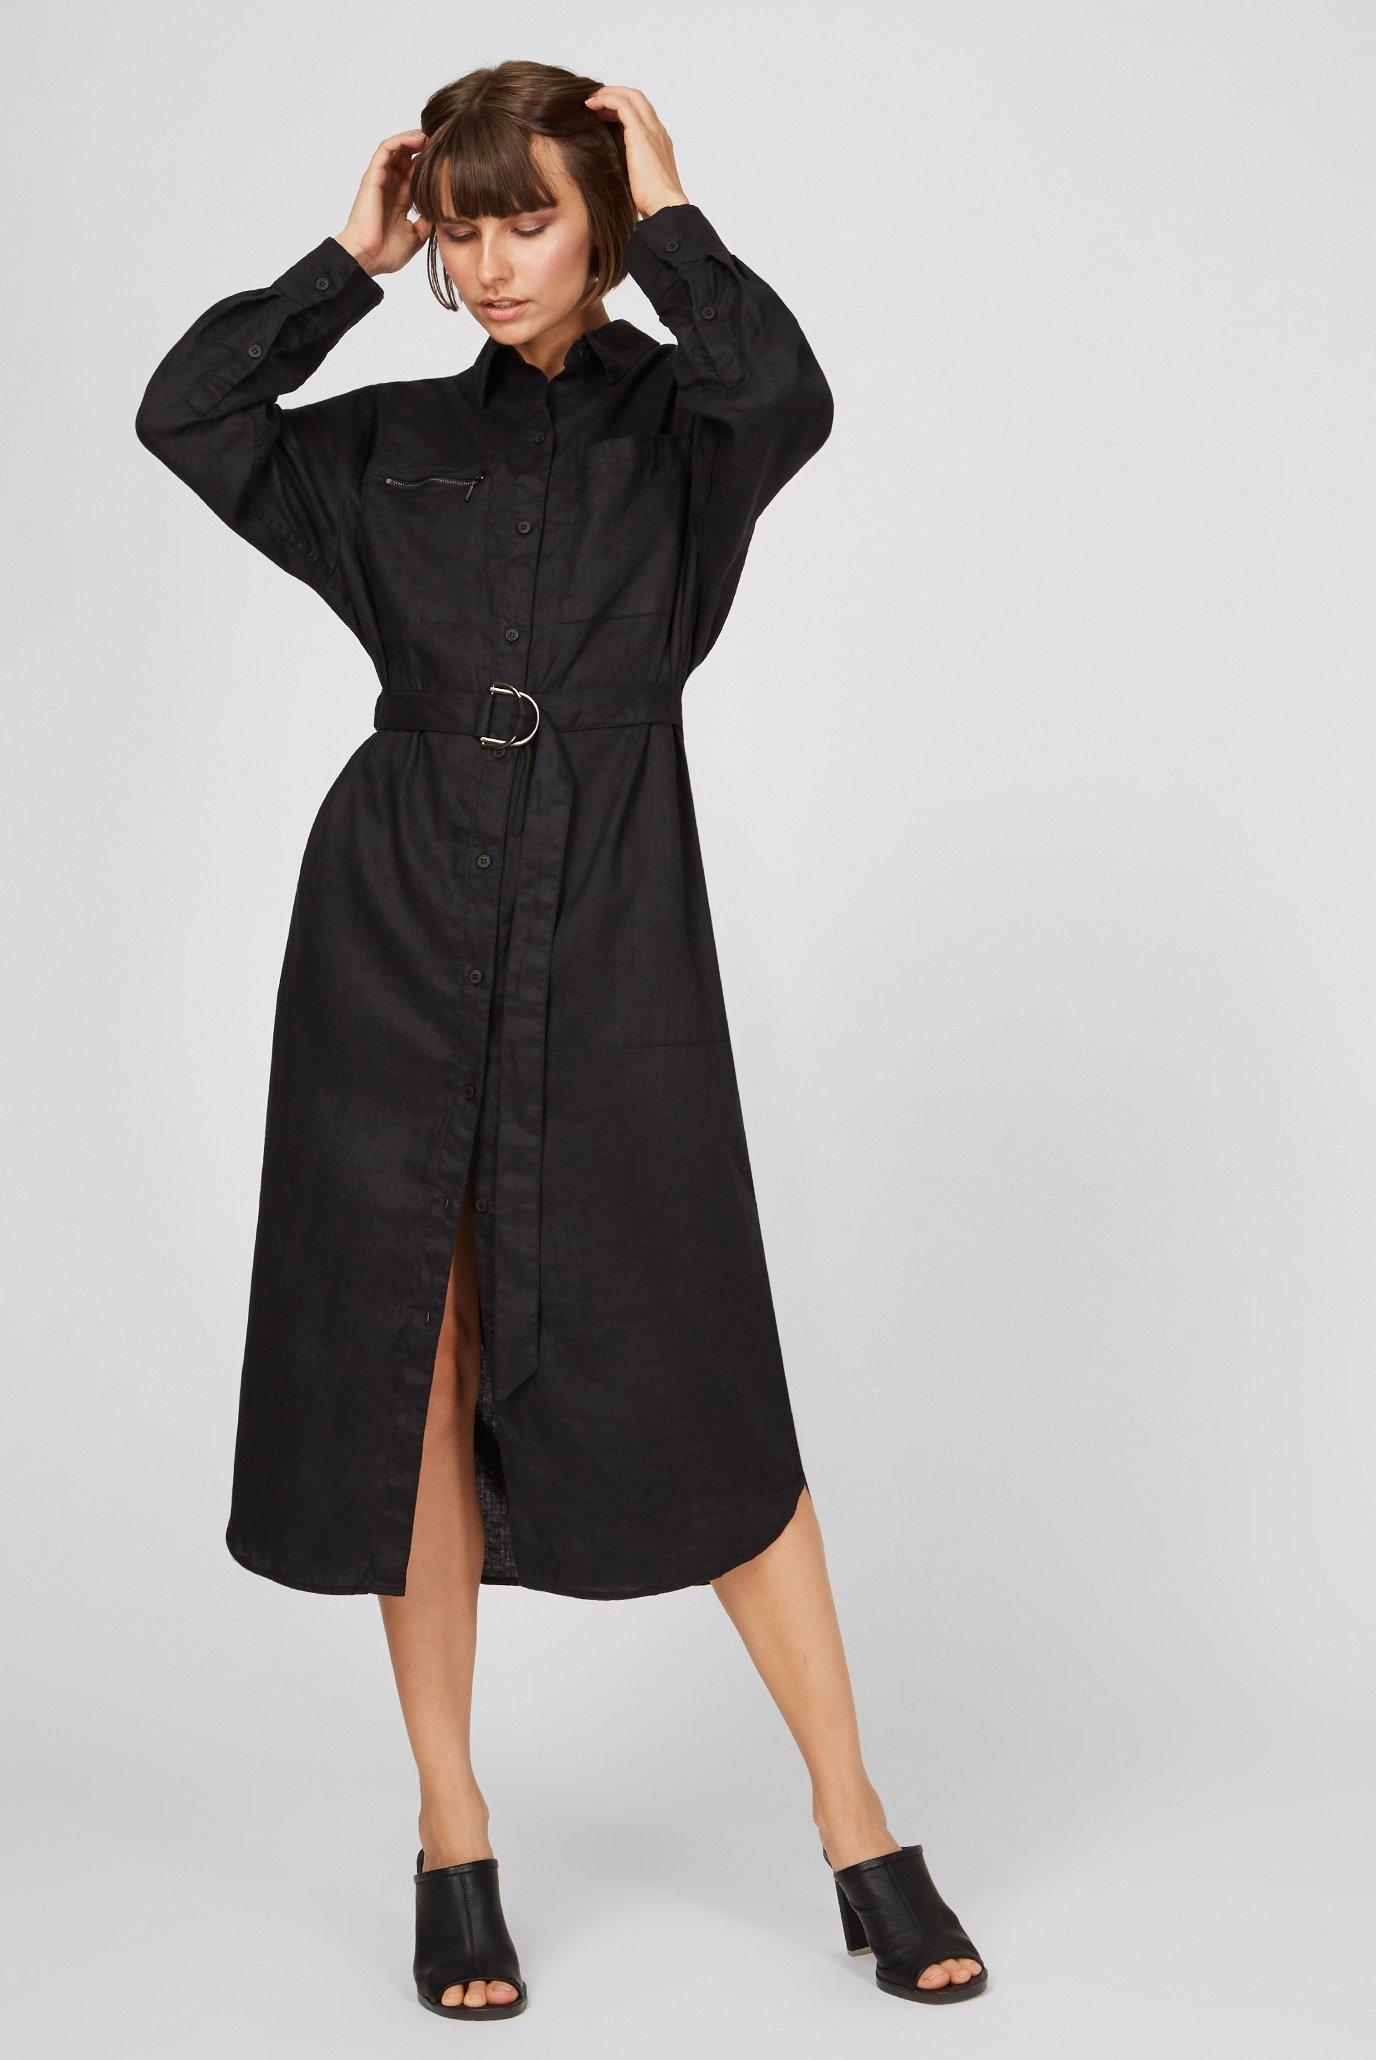 Жіноча чорна лляна сукня 1